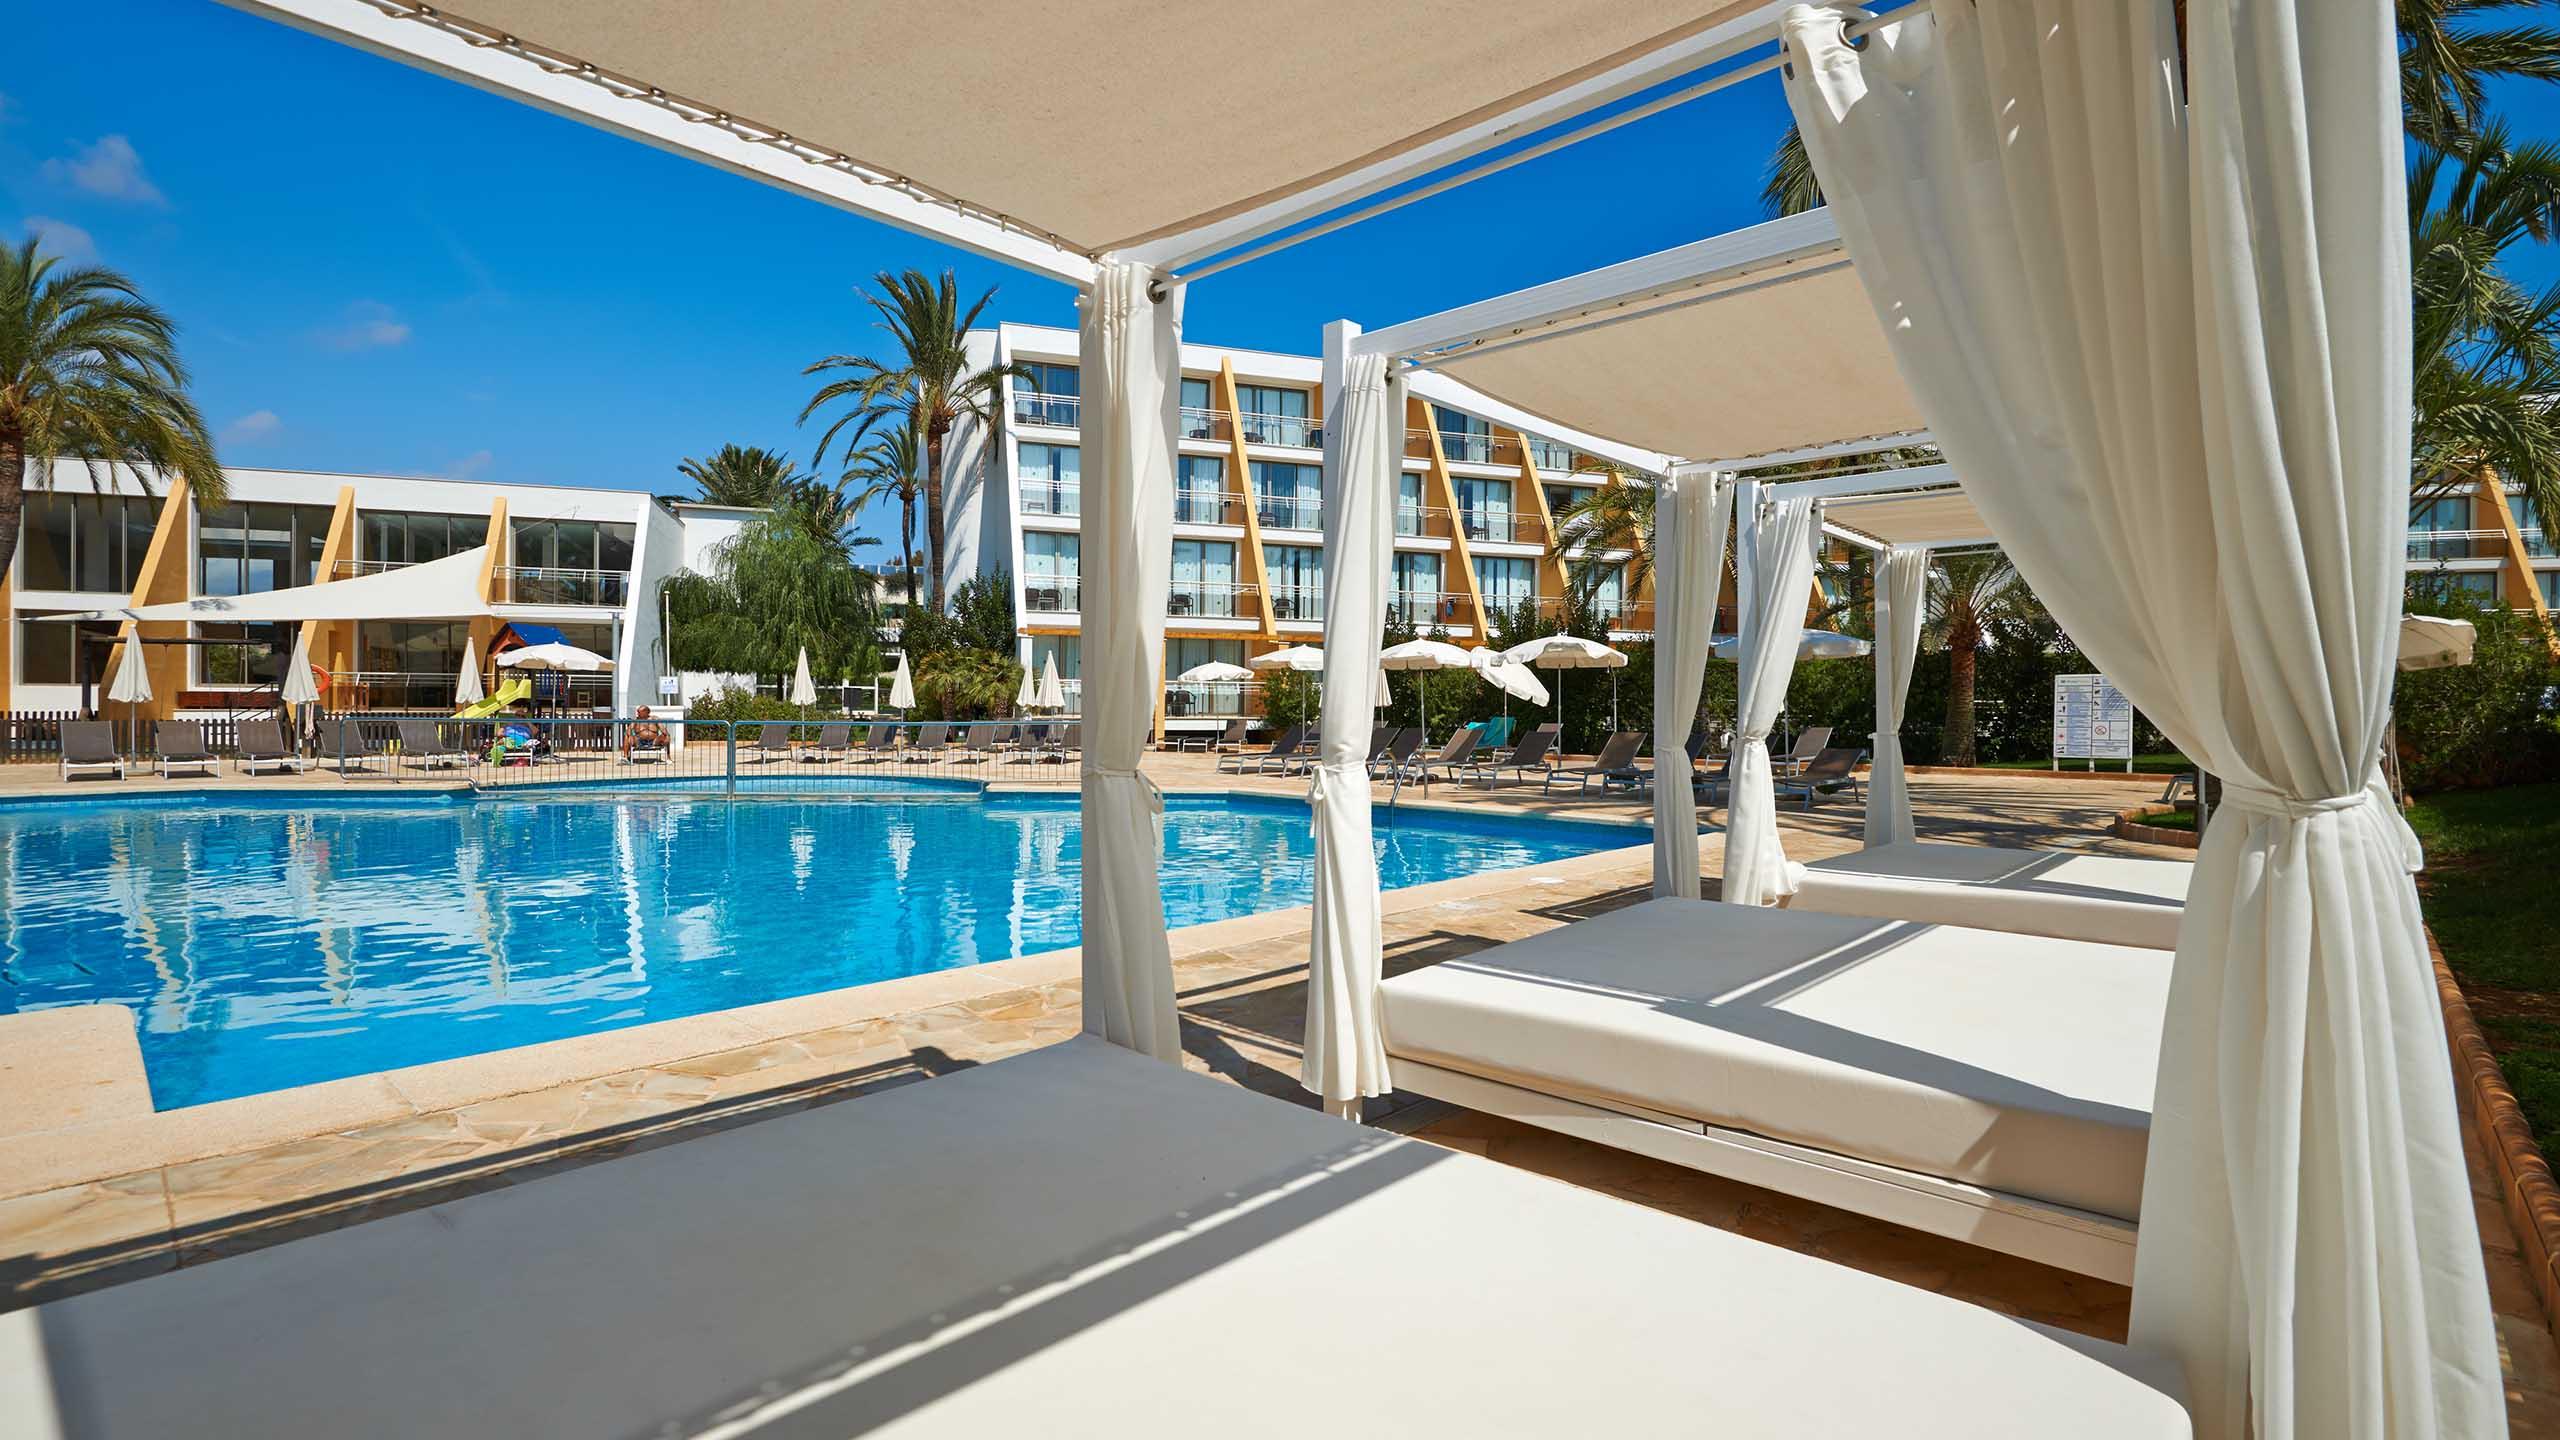 Protur Sa Coma Playa Hotel  U0026 Spa  In Sa Coma  Majorca